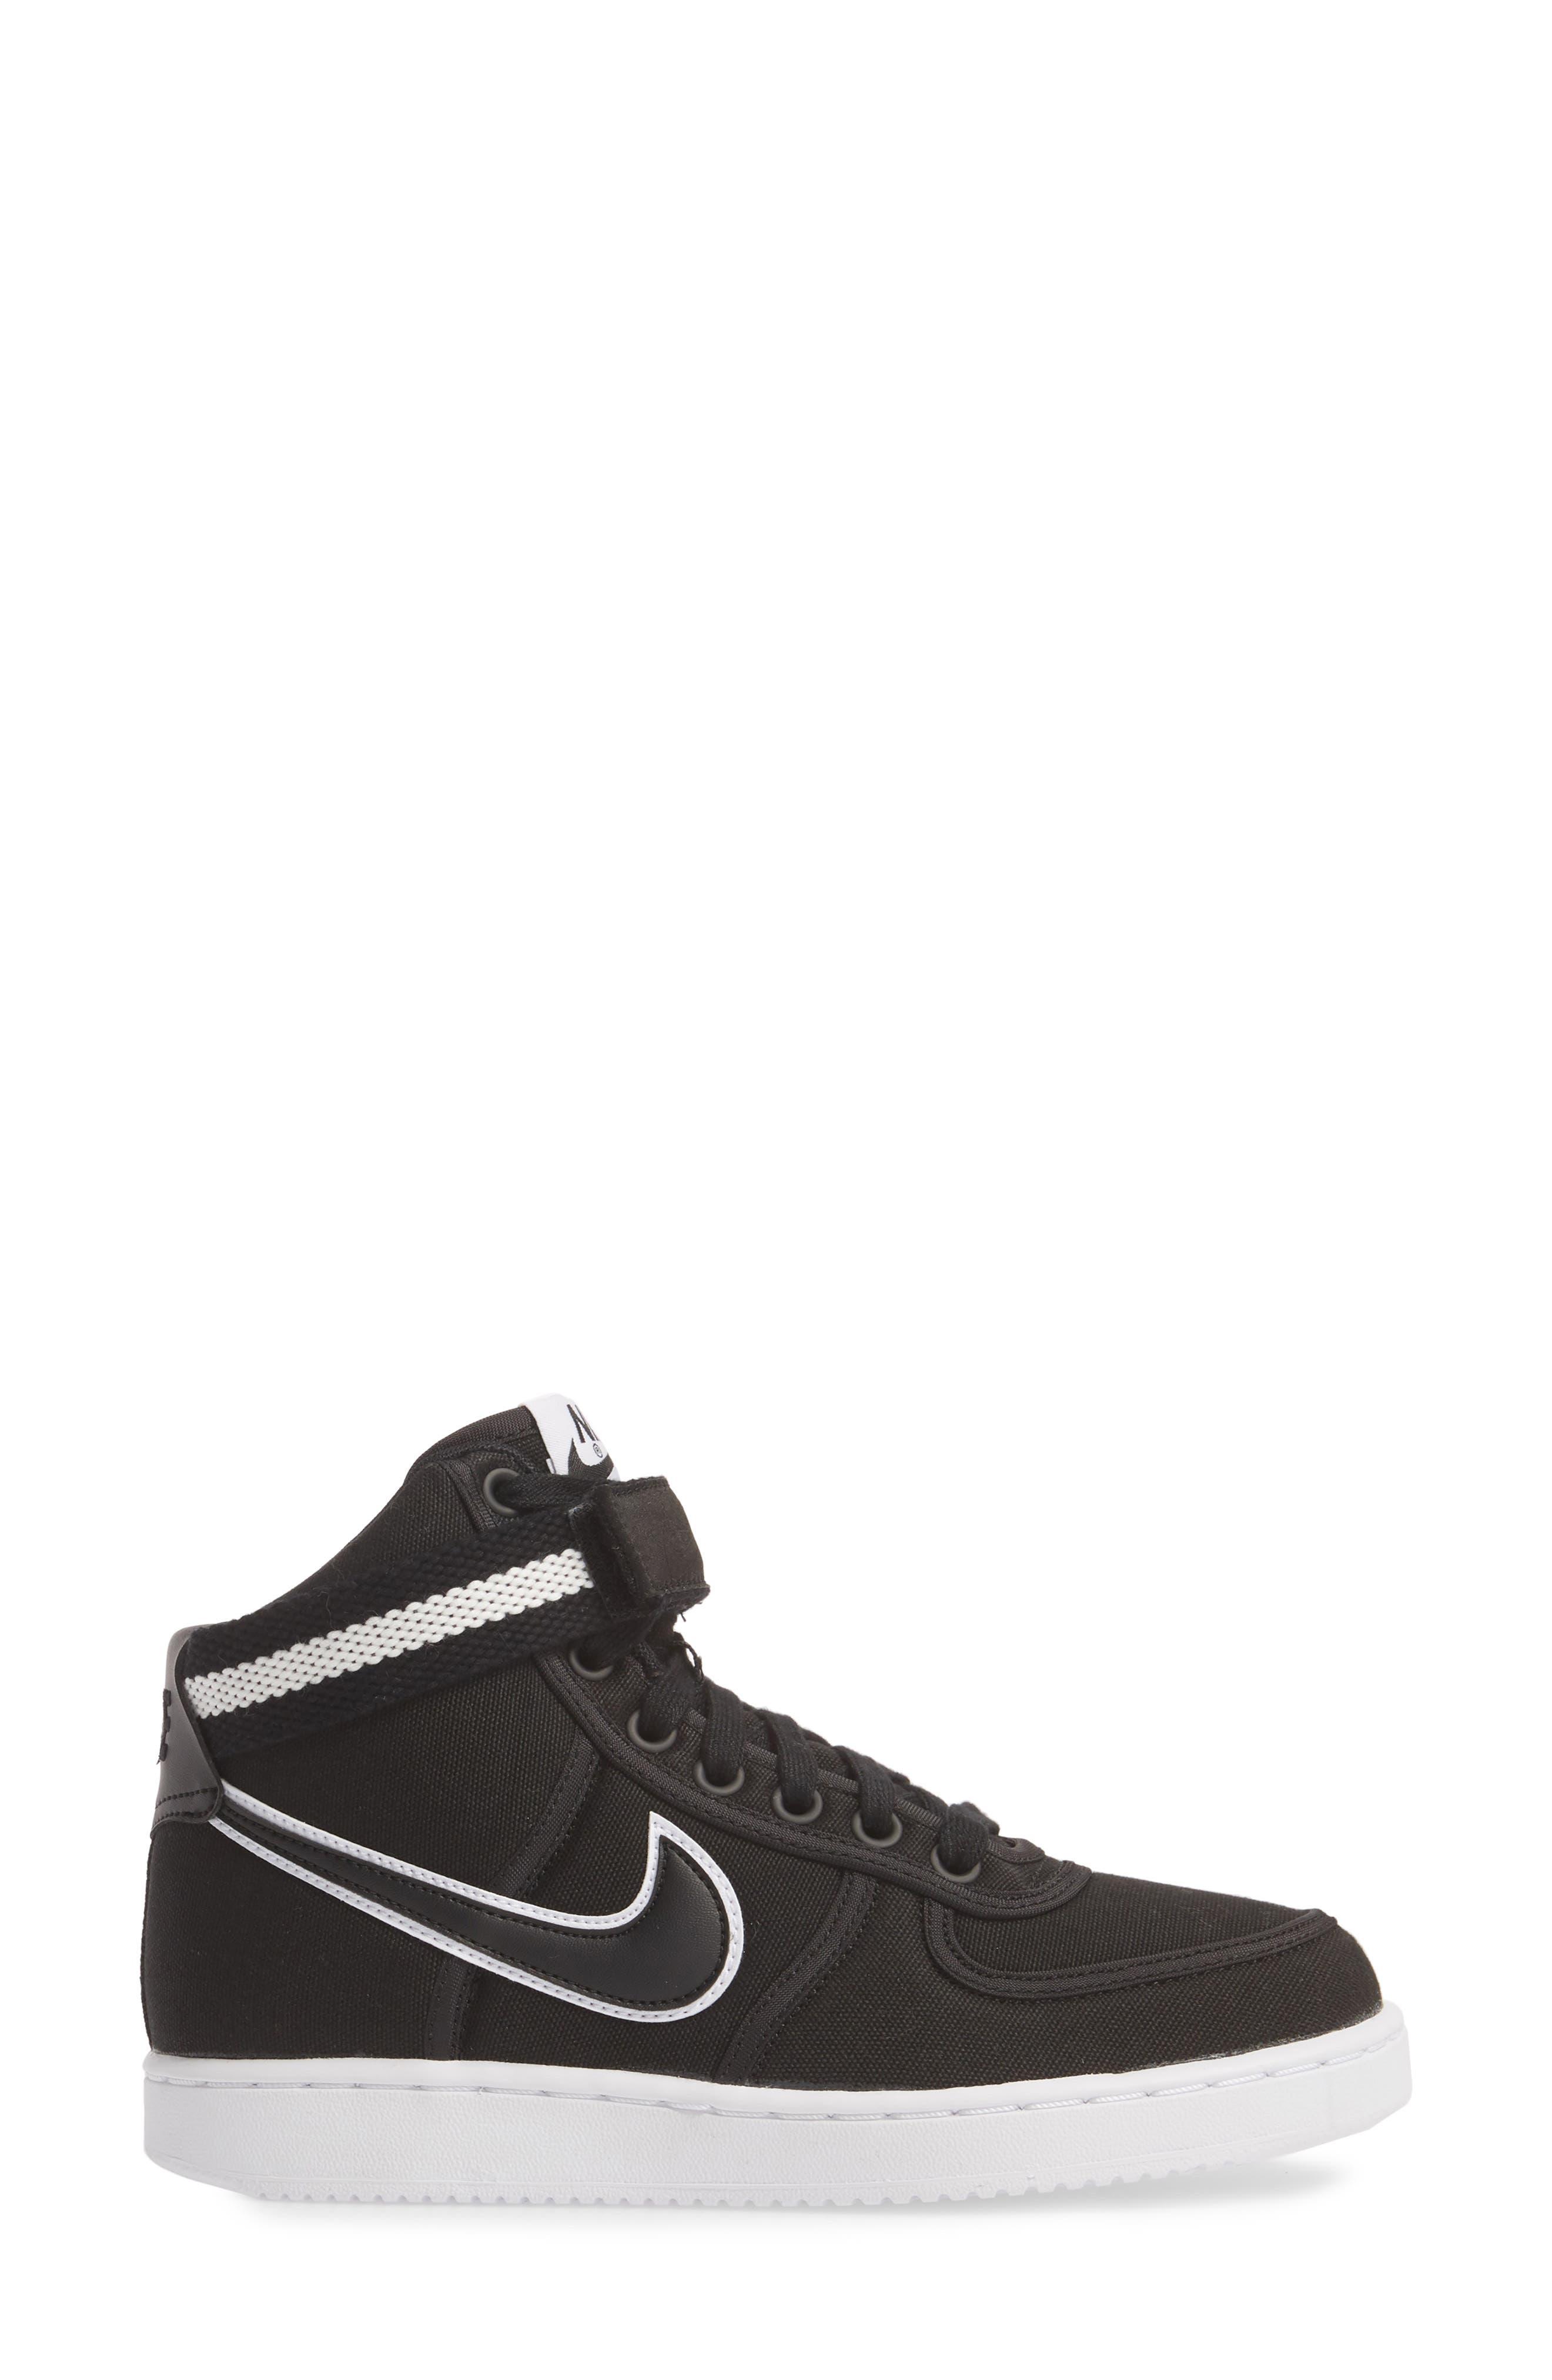 Vandal High Top Sneaker,                             Alternate thumbnail 3, color,                             BLACK/ BLACK-WHITE